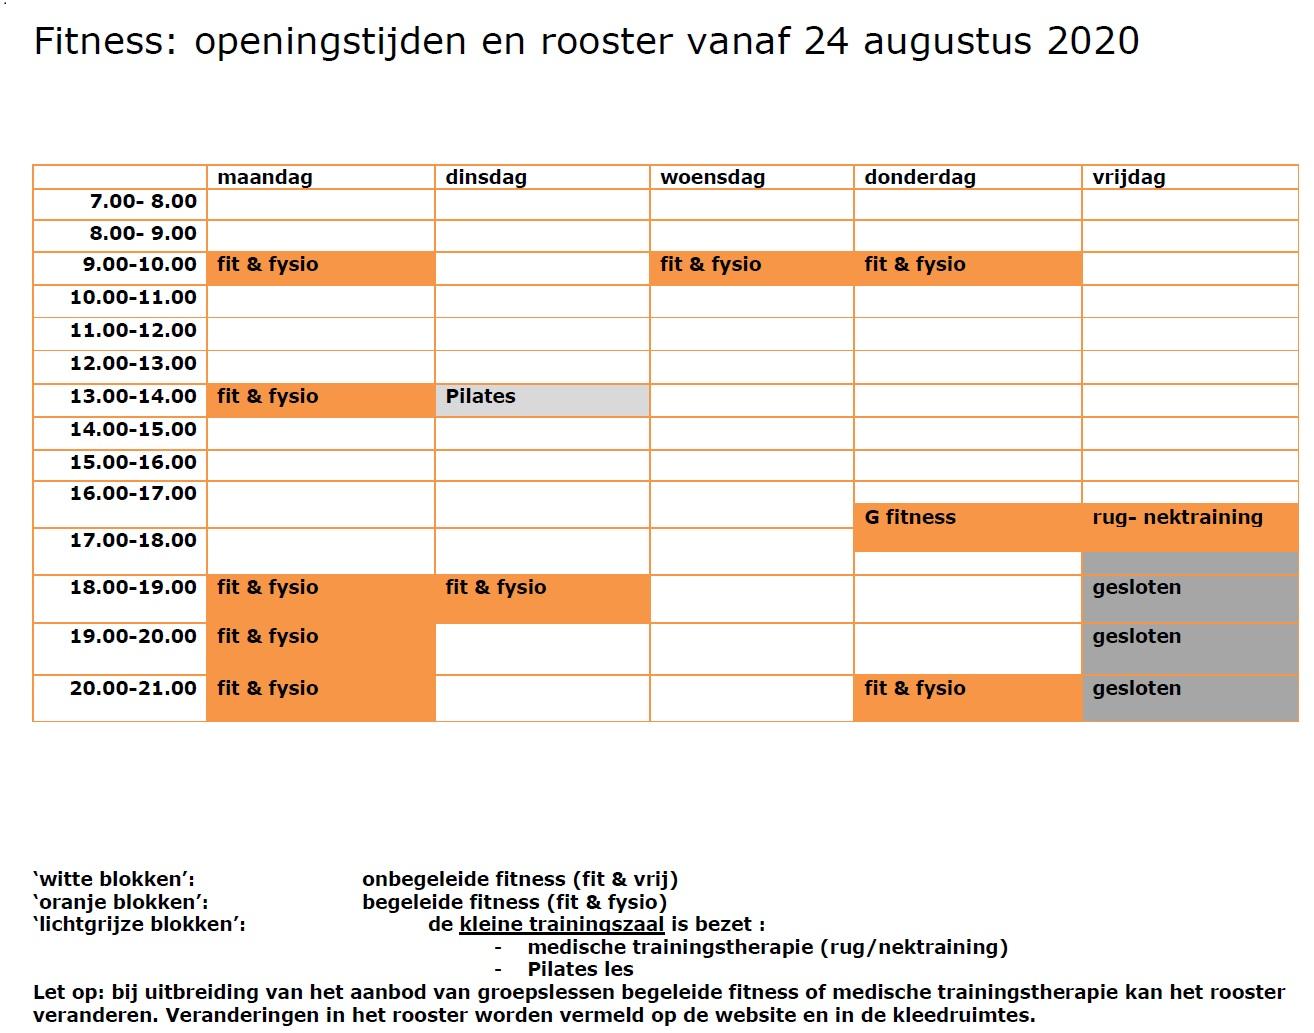 fitness-openingstijden-200824